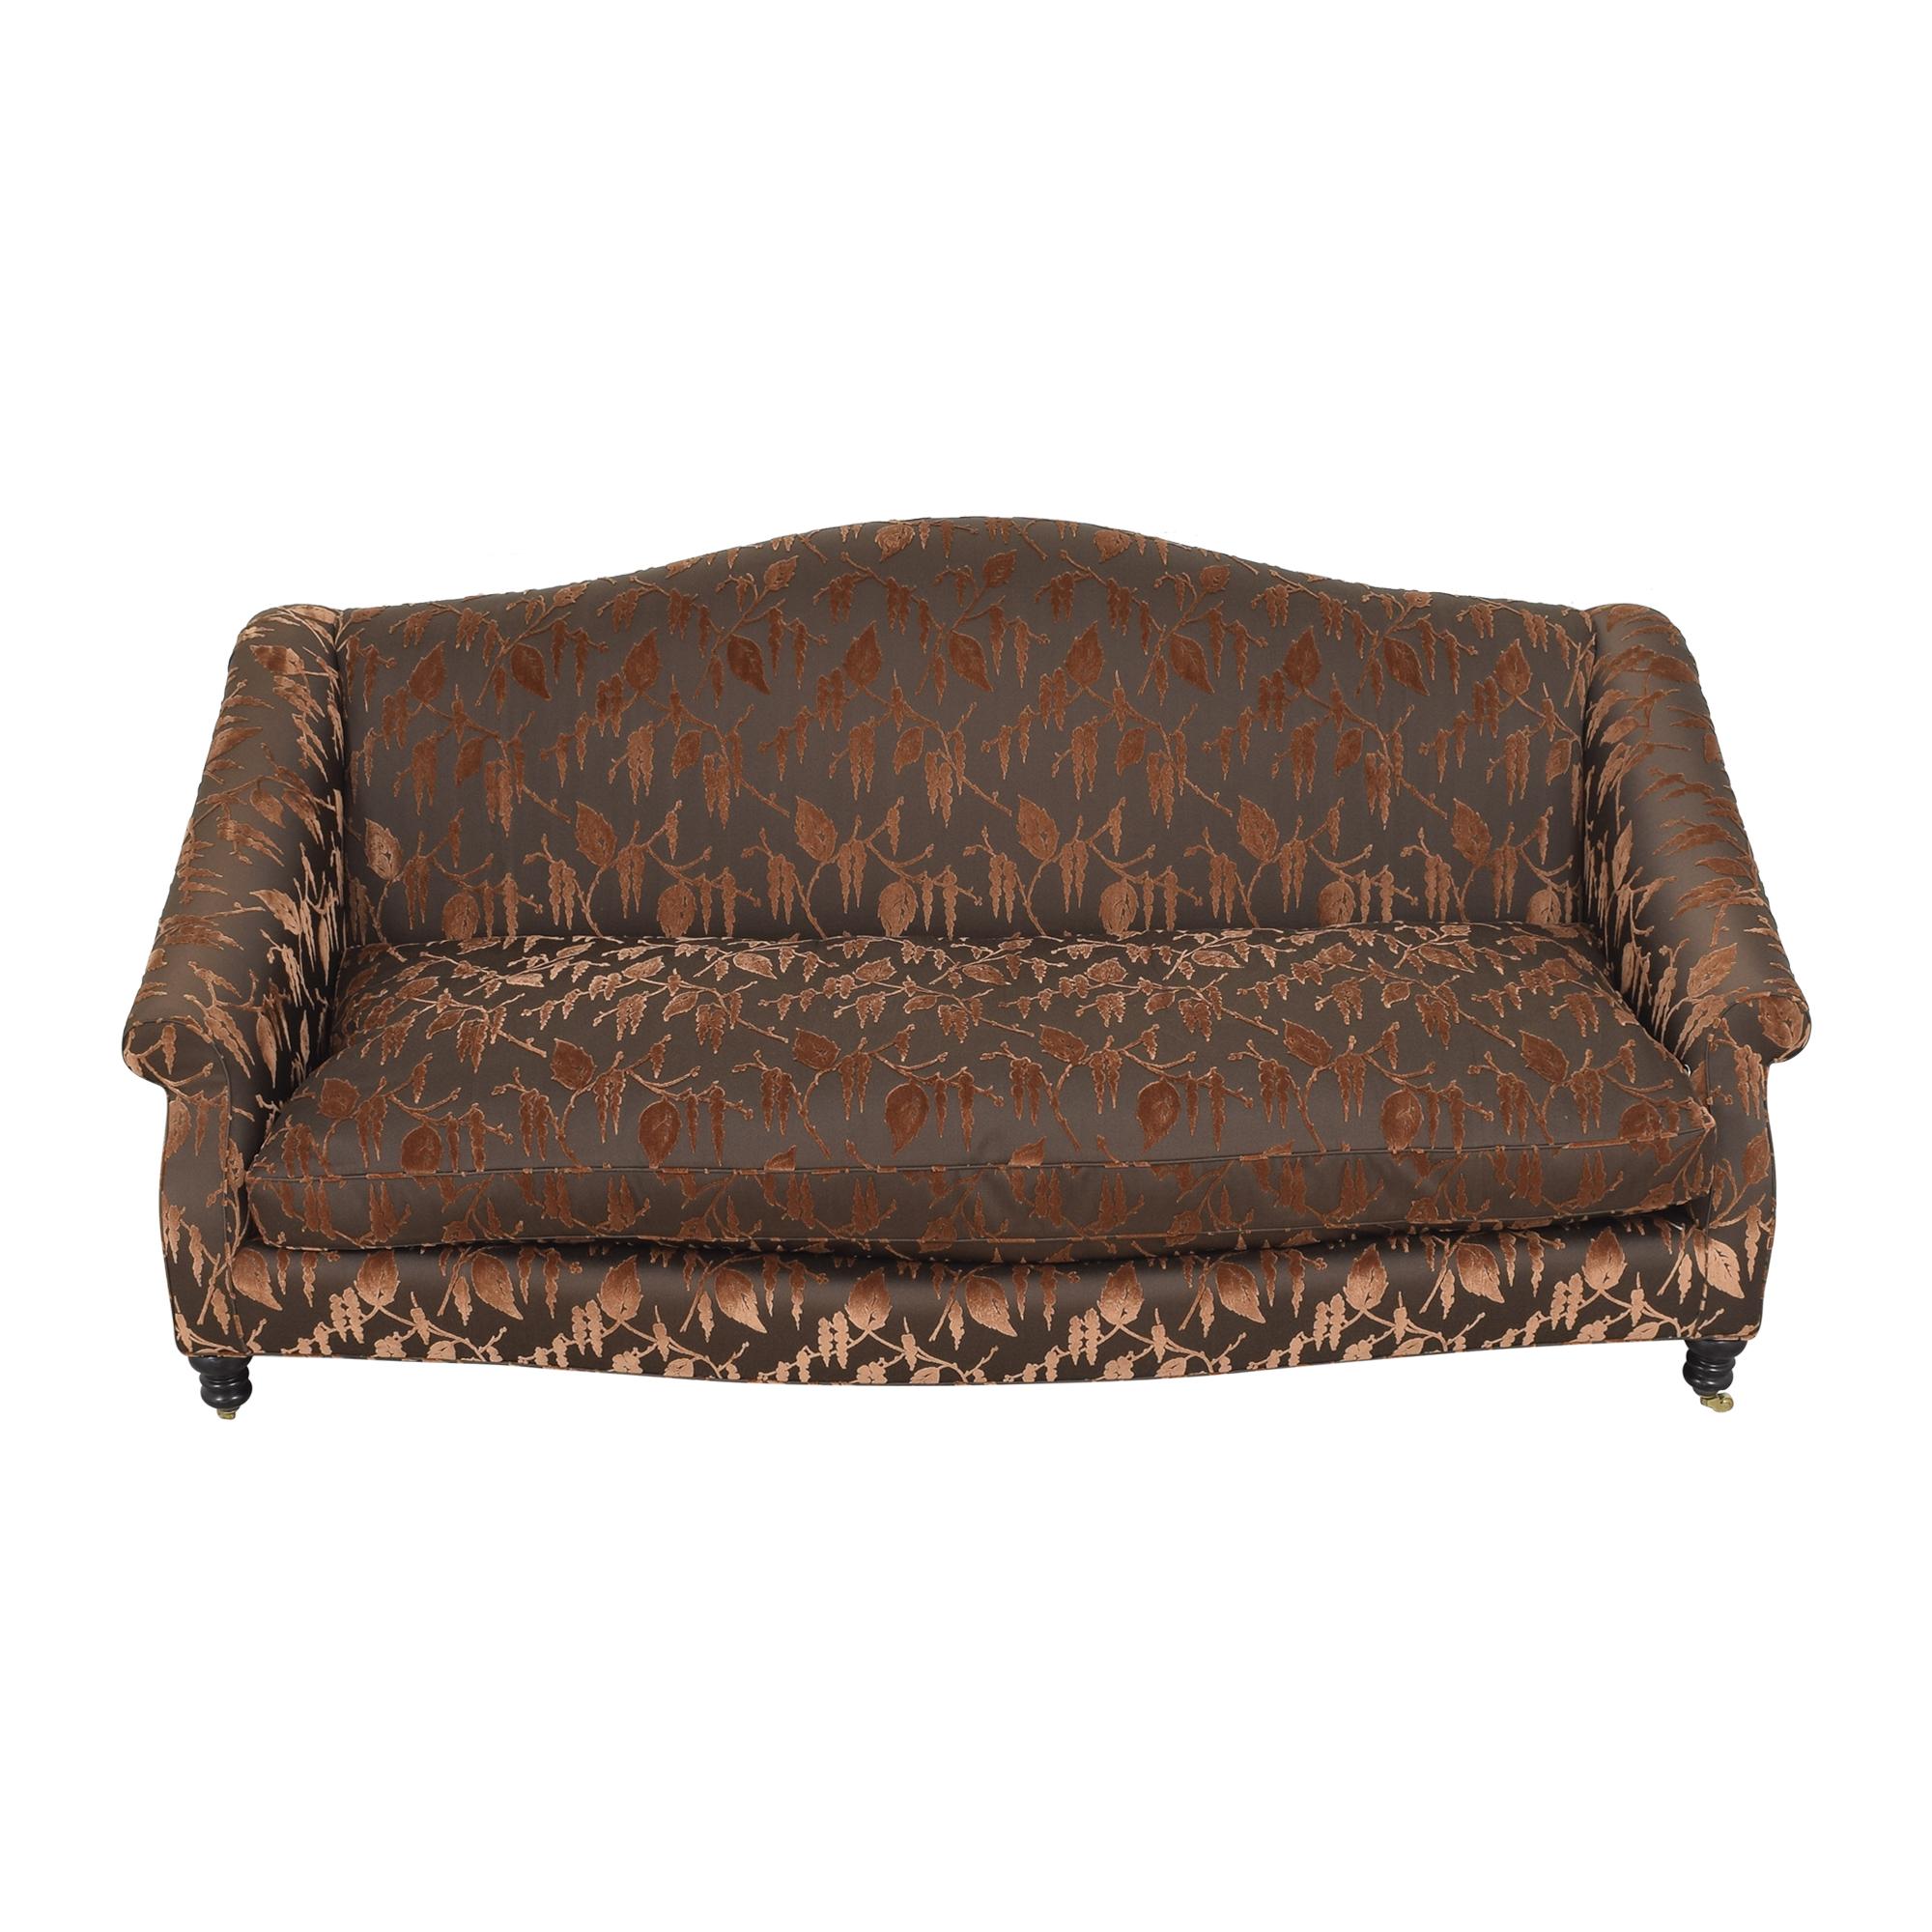 John Boone John Boone Camelback Sofa on sale